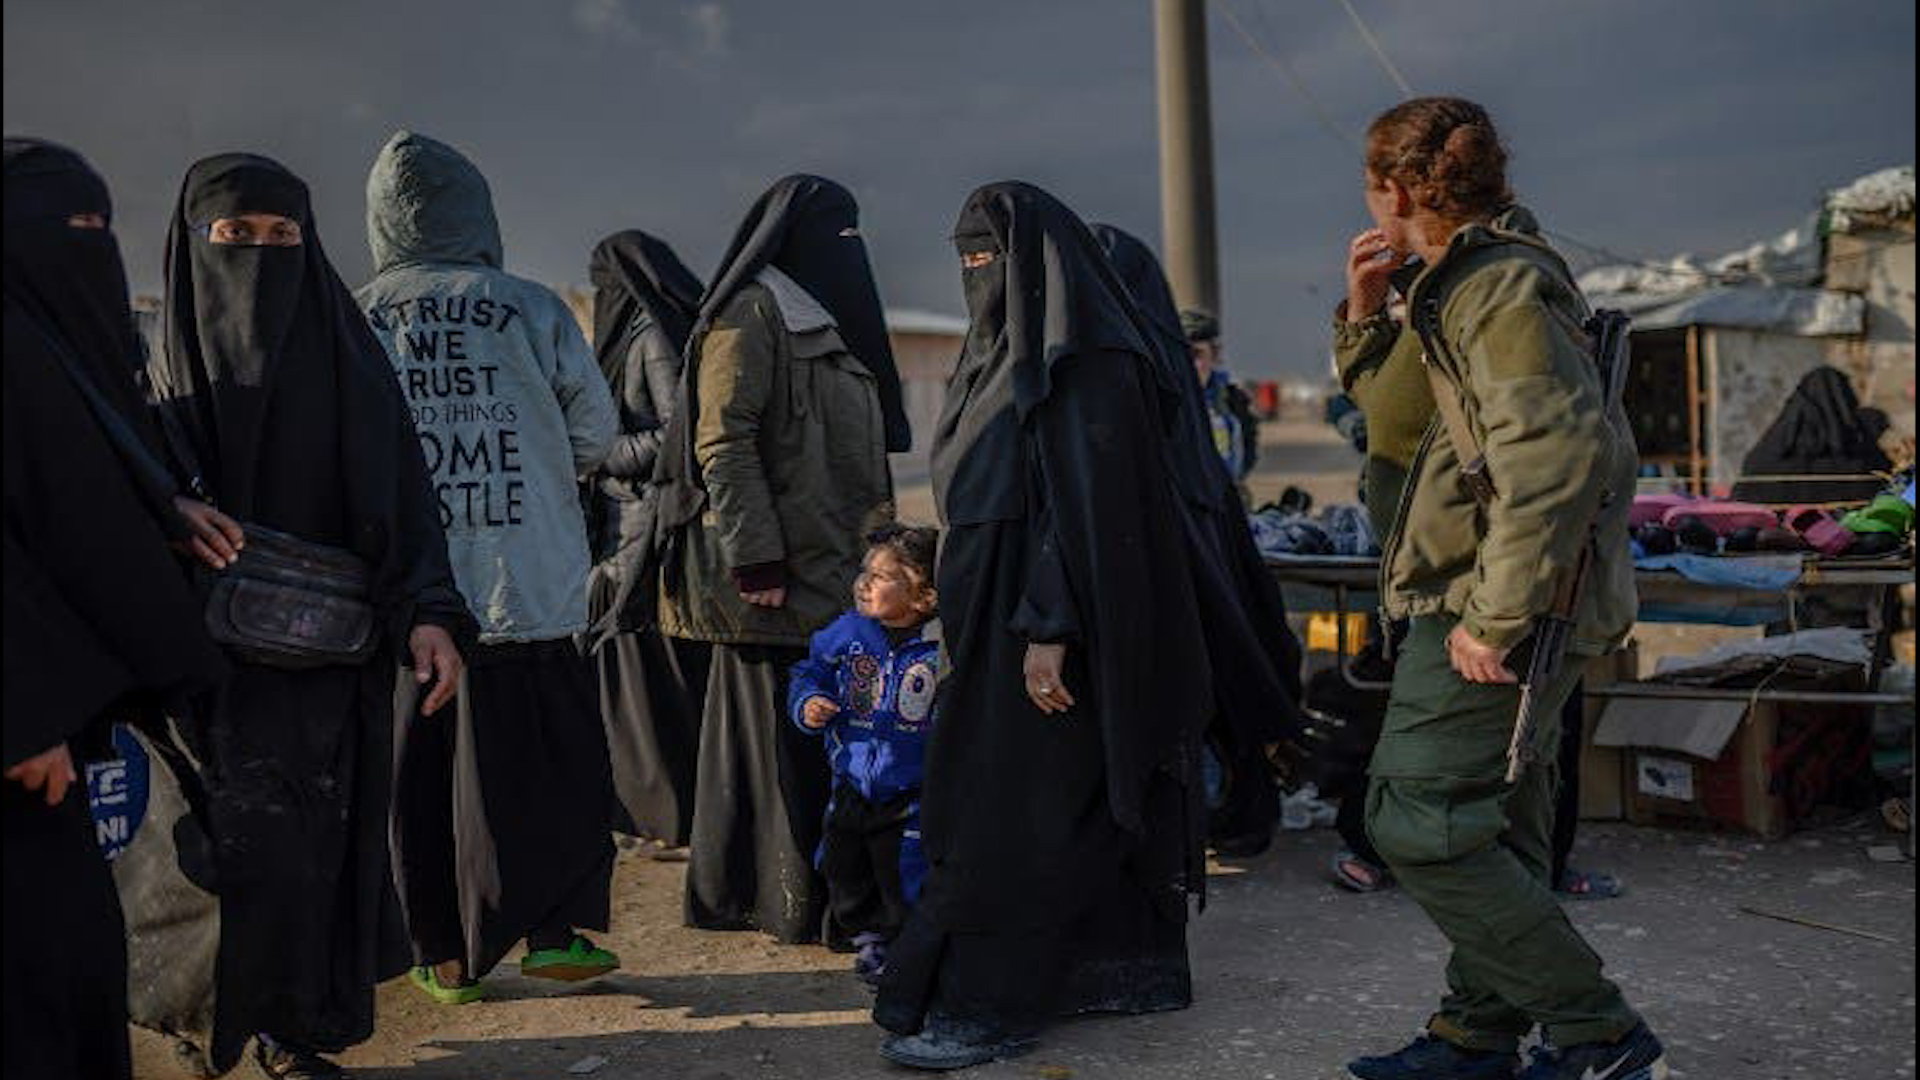 Photo of زوجات مرتزقة داعش لا تقلن خطورة عن أزواجهن بزرع الفكر المتطرف في عقول أطفالهن